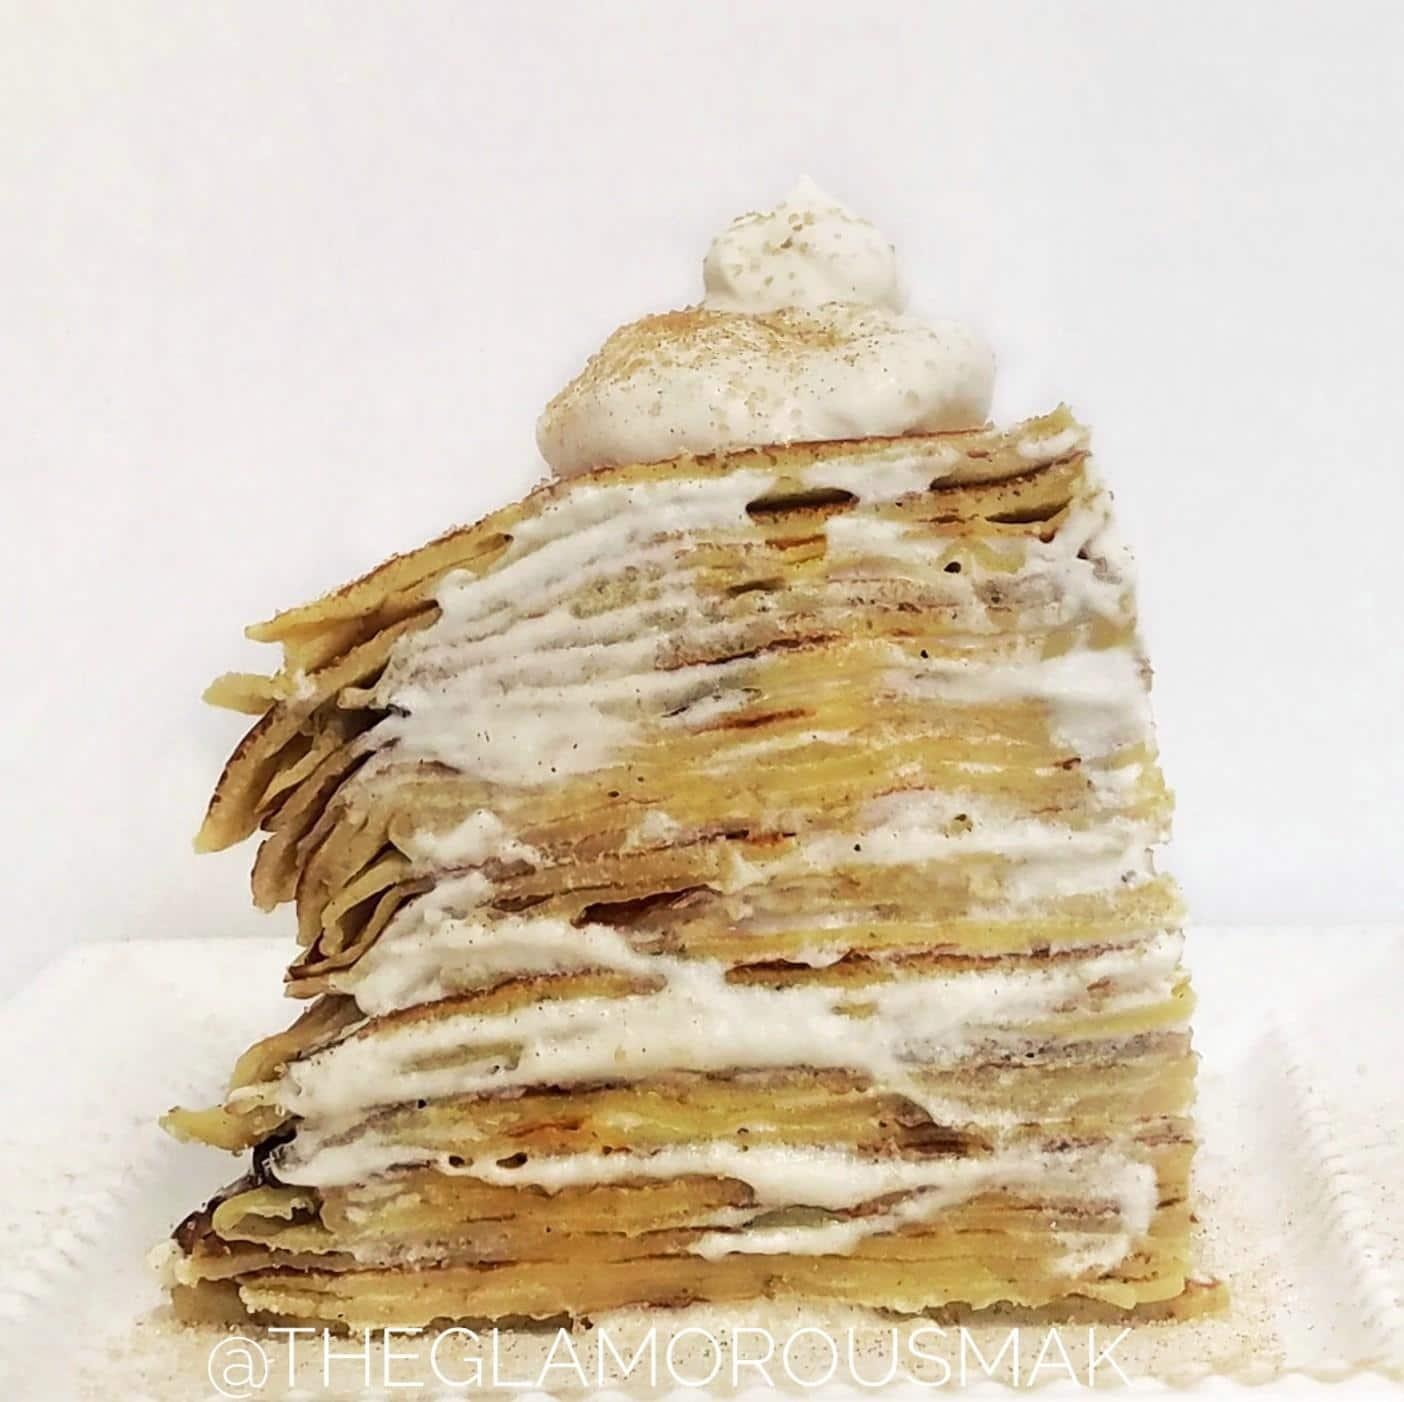 Cardamom Vanilla Crepe Cake with Maple Whip